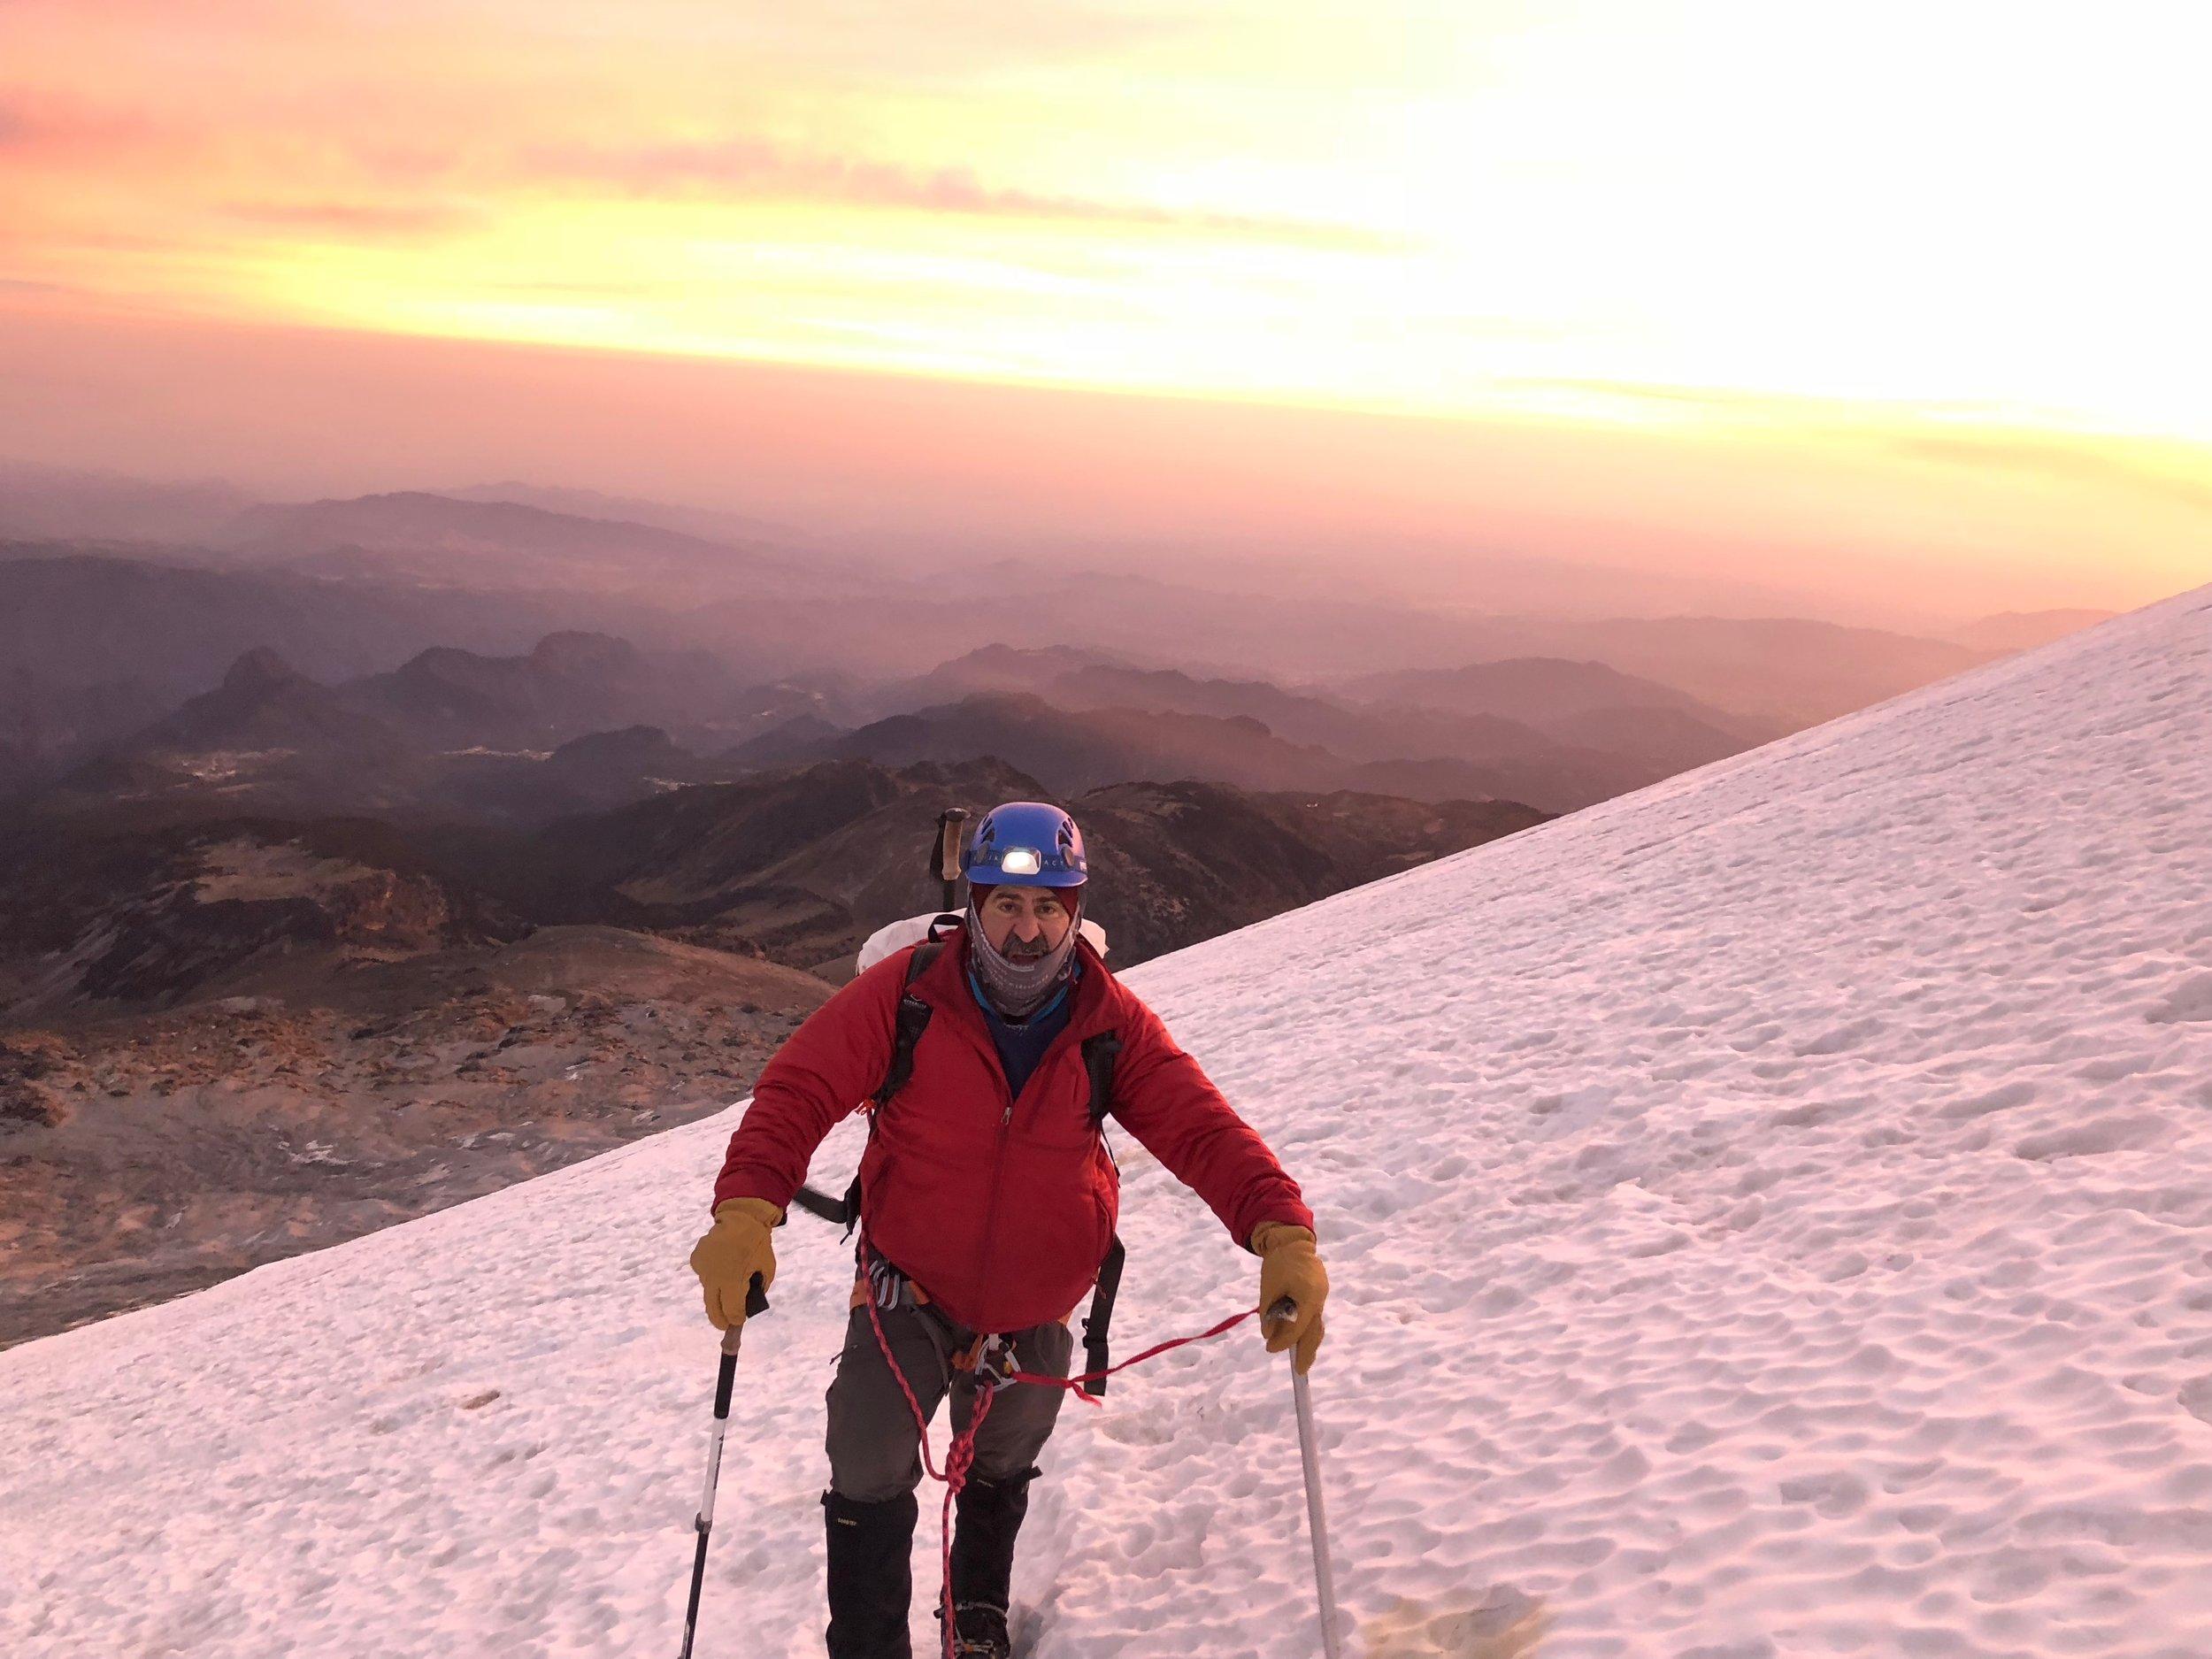 orizaba sunrise summit ctss bruce